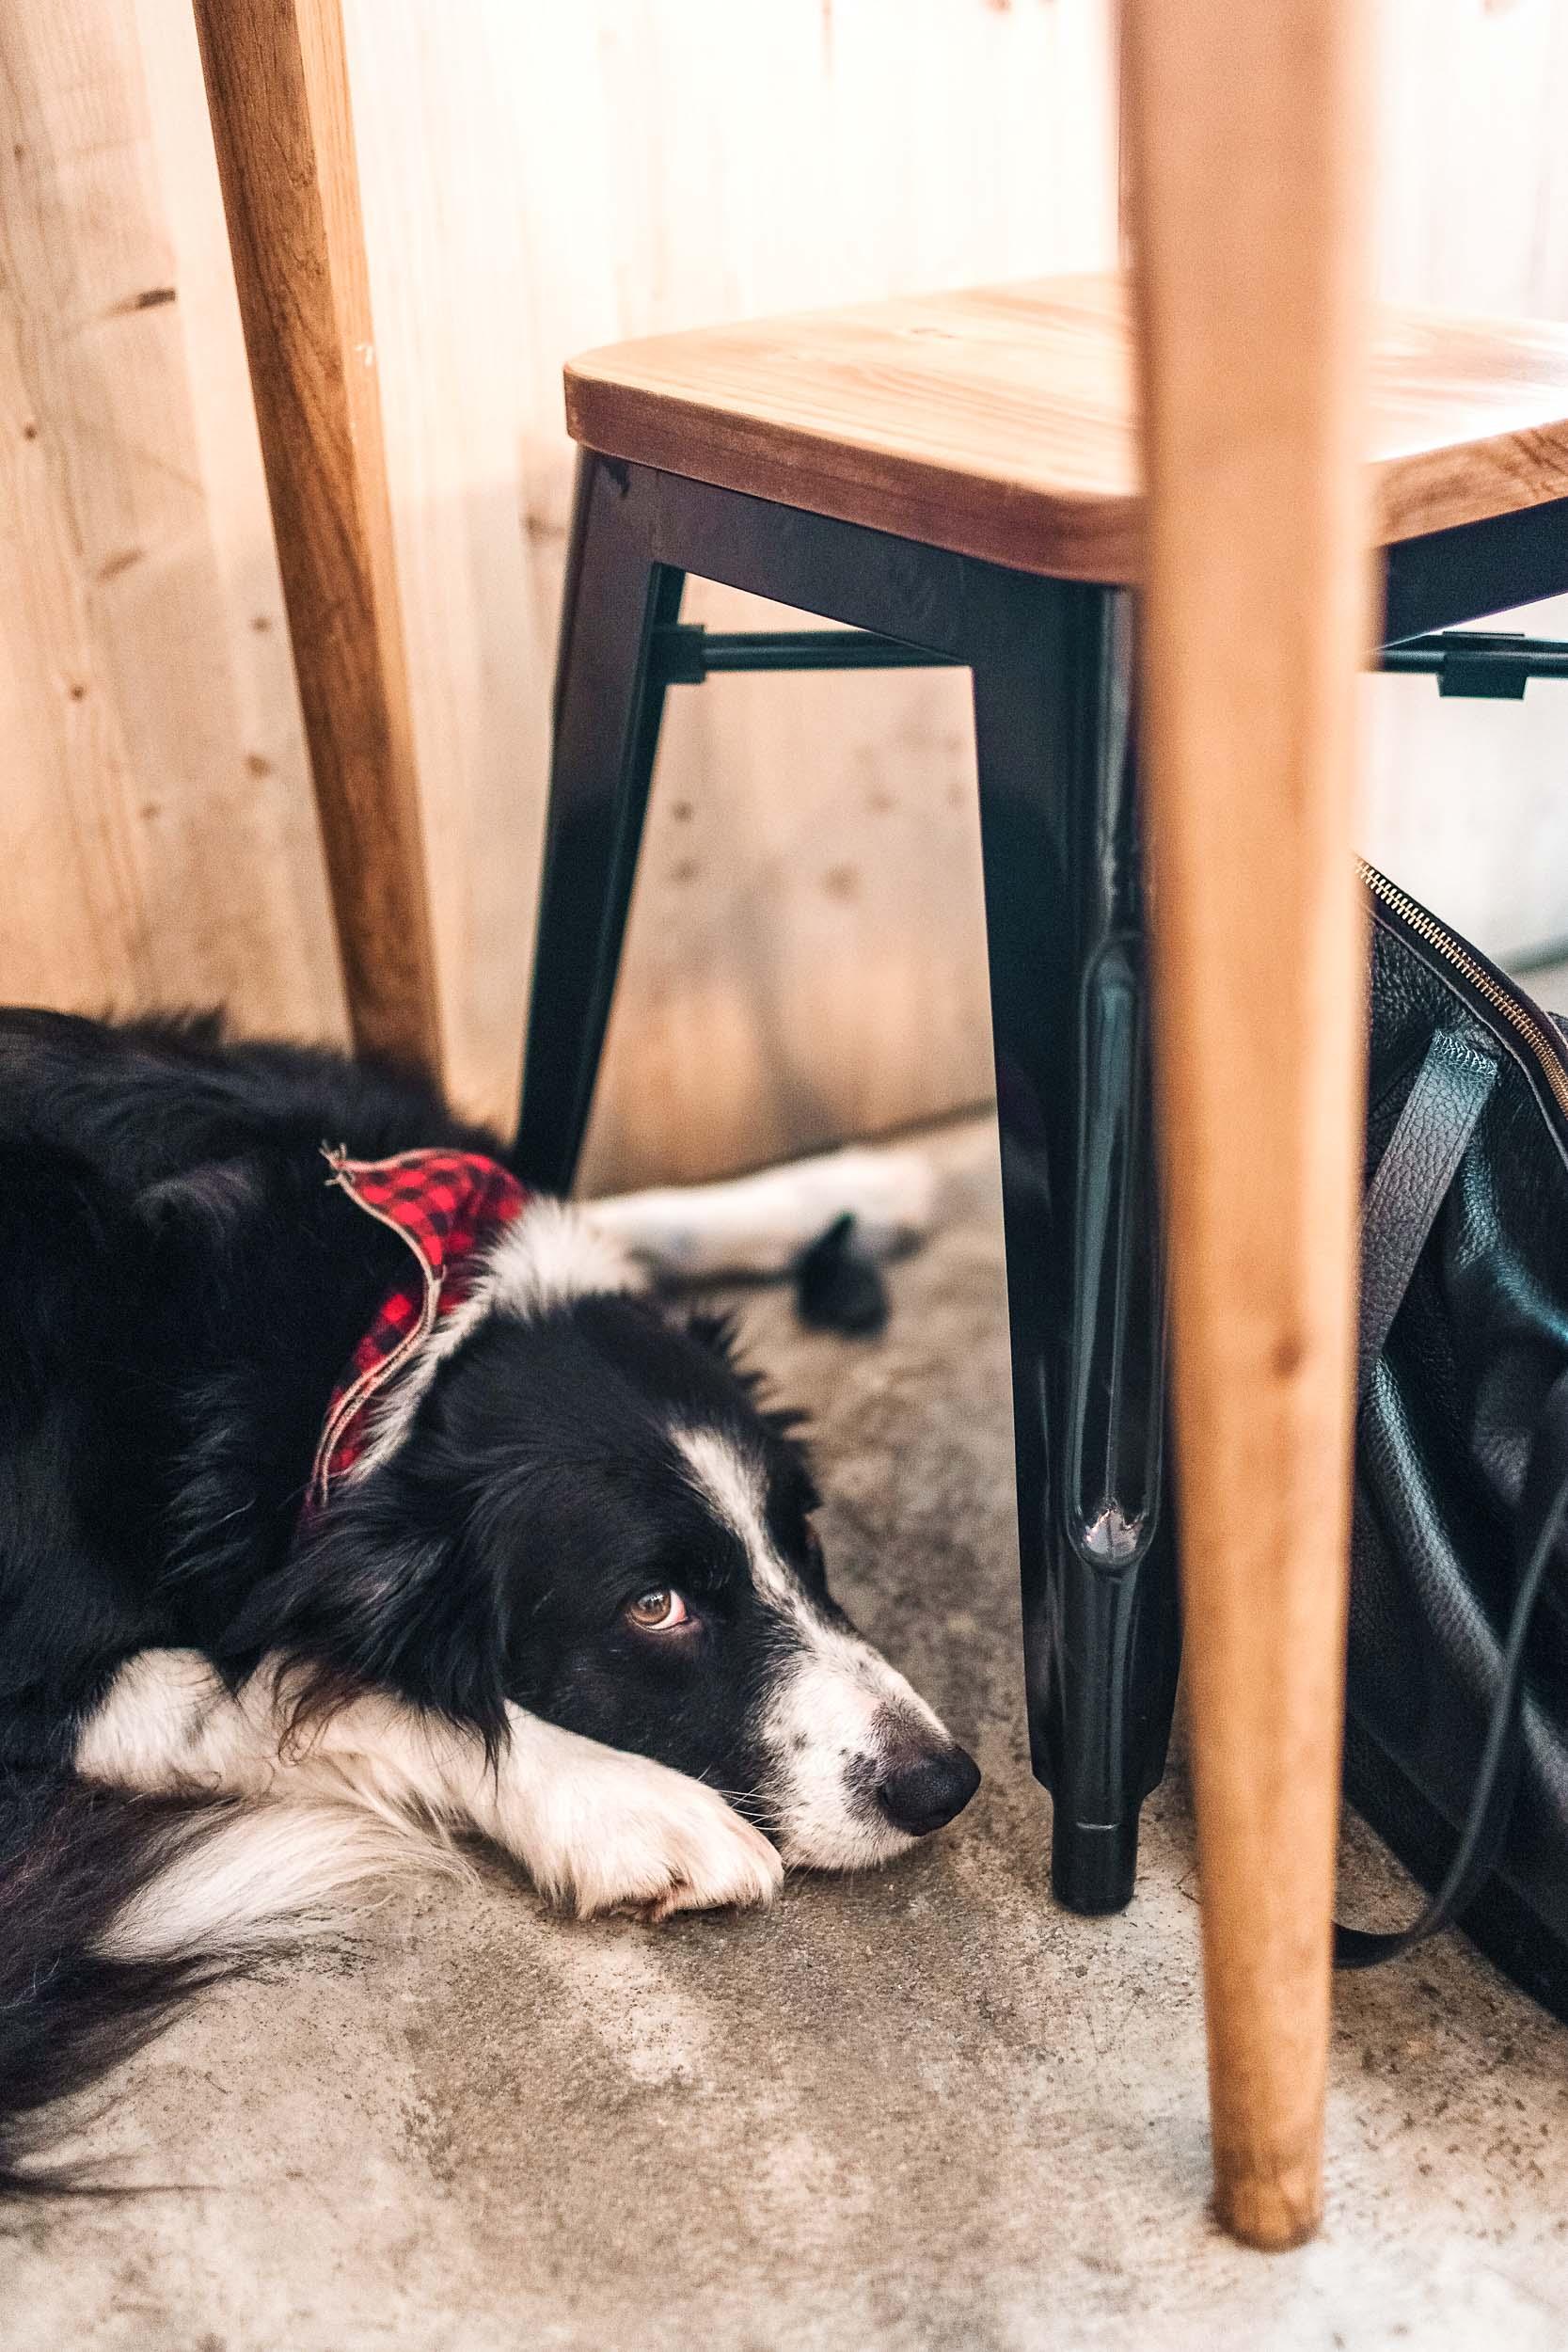 Hello, Kristof in Lisbon is a dog friendly specialty coffee shop!